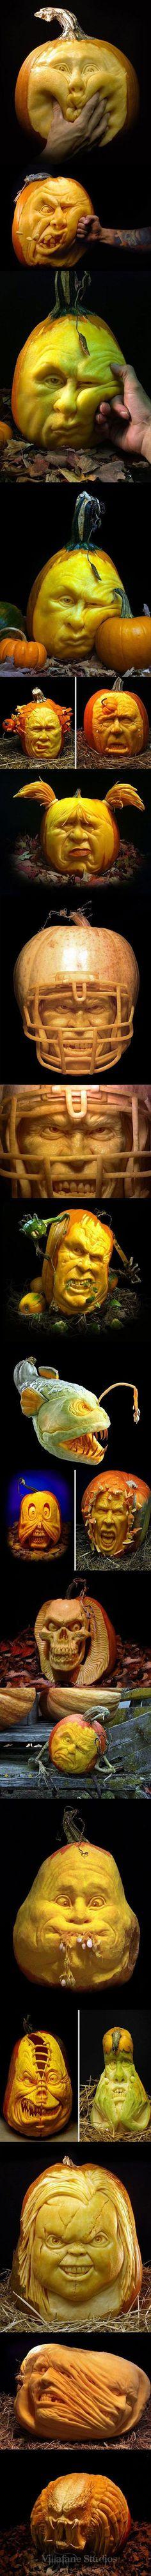 Amazing halloween pumpkin carvings!